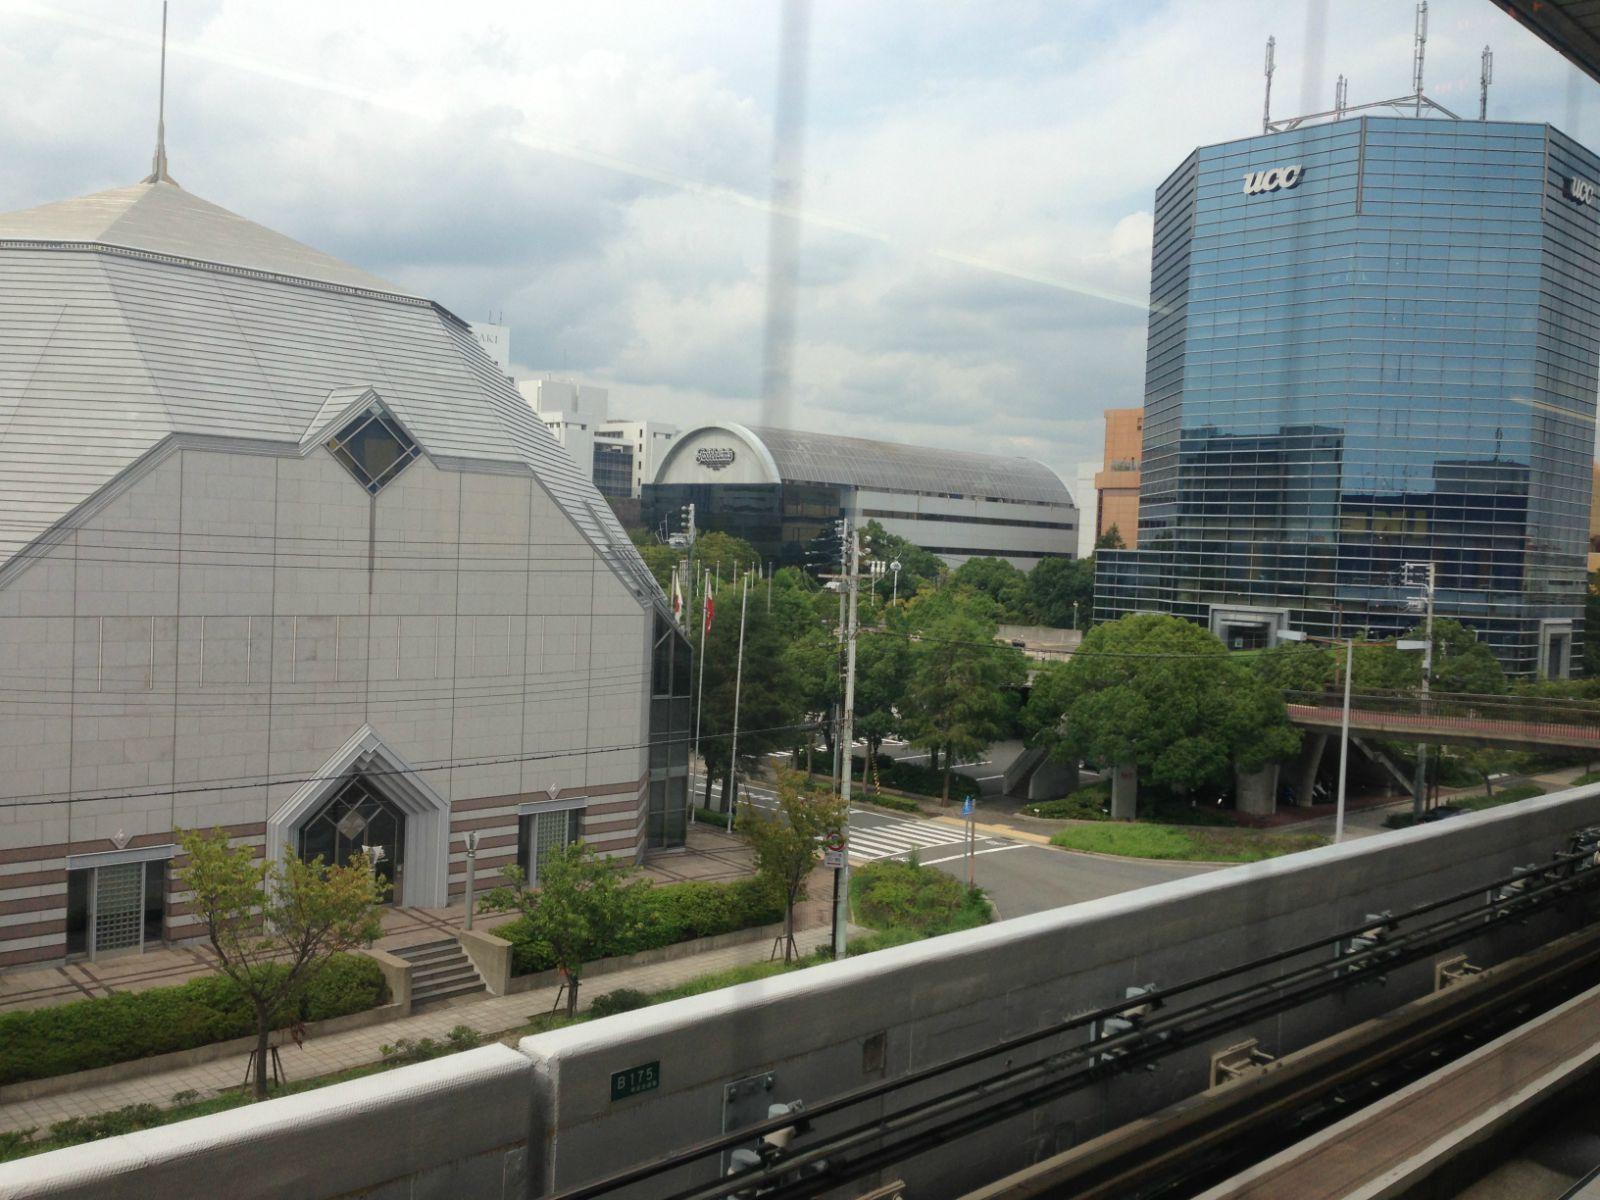 ucc博物馆在神户飞机场附近